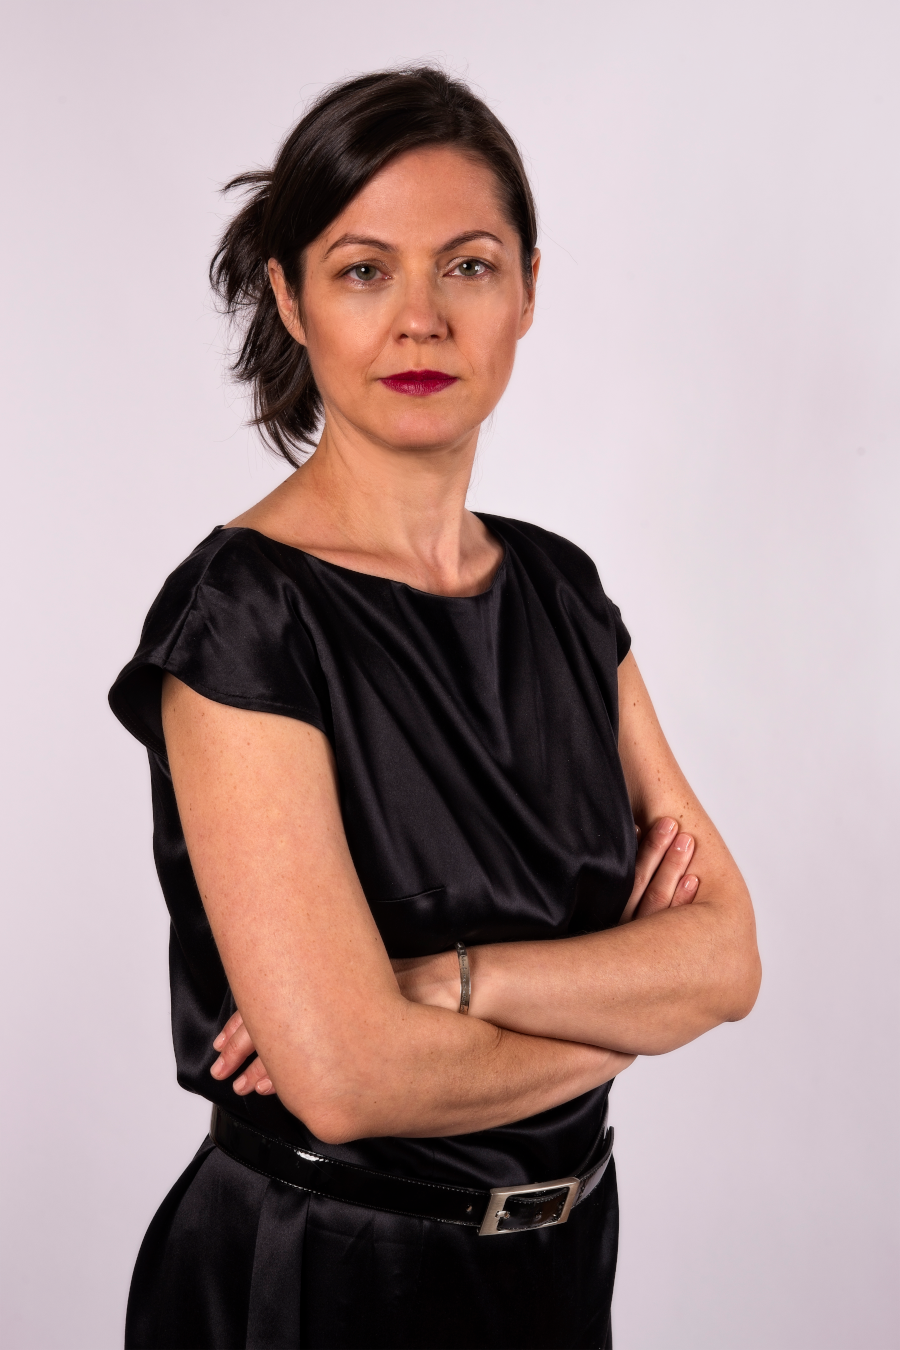 Marija Parente